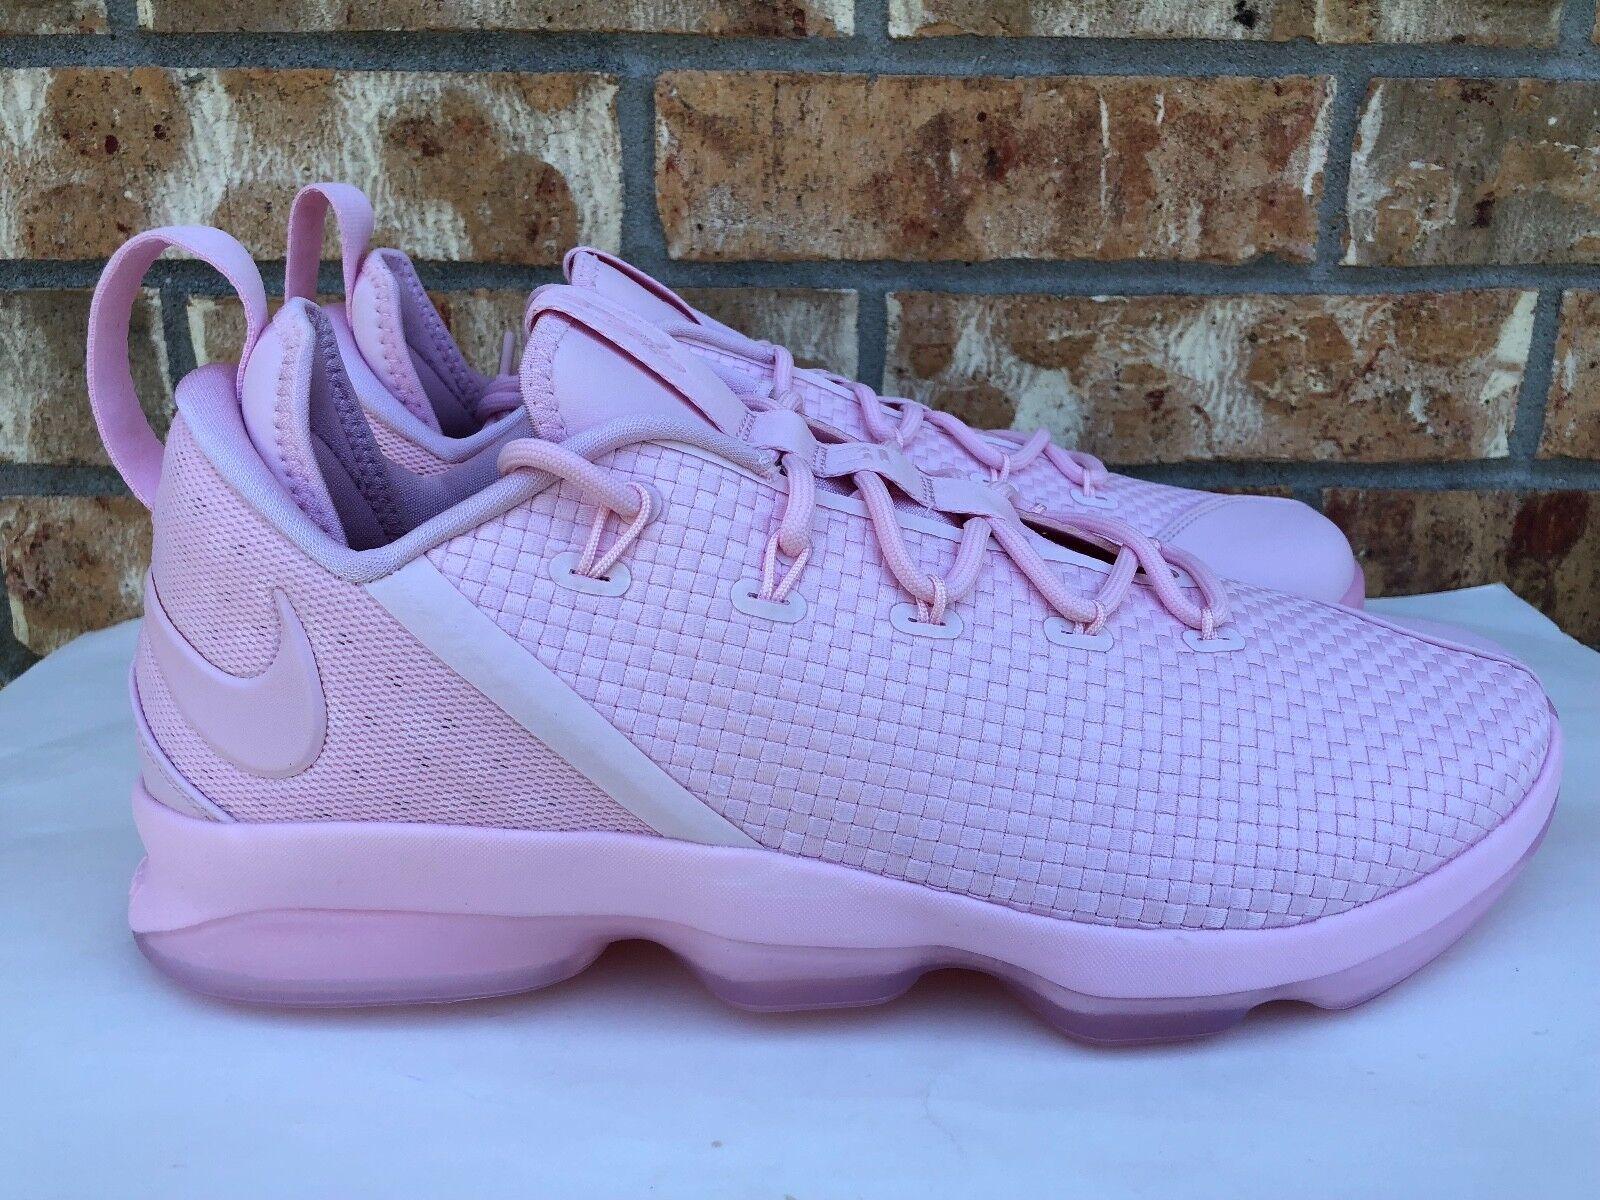 db9a6d88a8dc3 Men s Men s Men s Nike Lebron XIV 14 Lows Basketball Shoes Triple Prism  Pink 878636-600 a1fcef